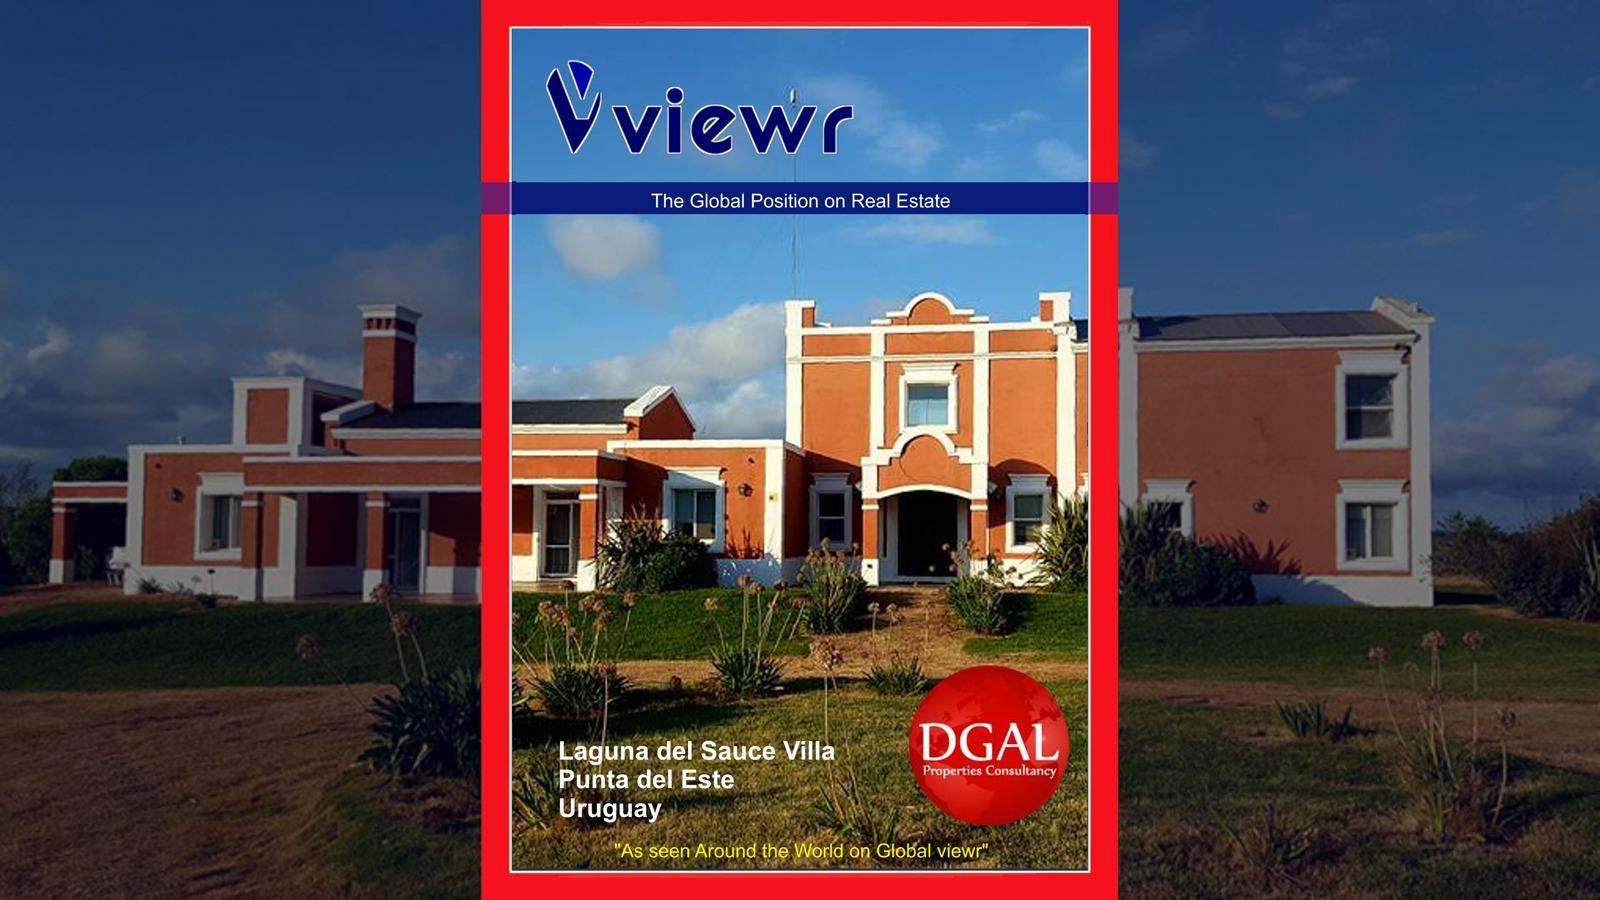 Global viewr Magazine DGAL Properties Consultancy Uruguay Argentina Punta del Este Laguna del Sauce Villa